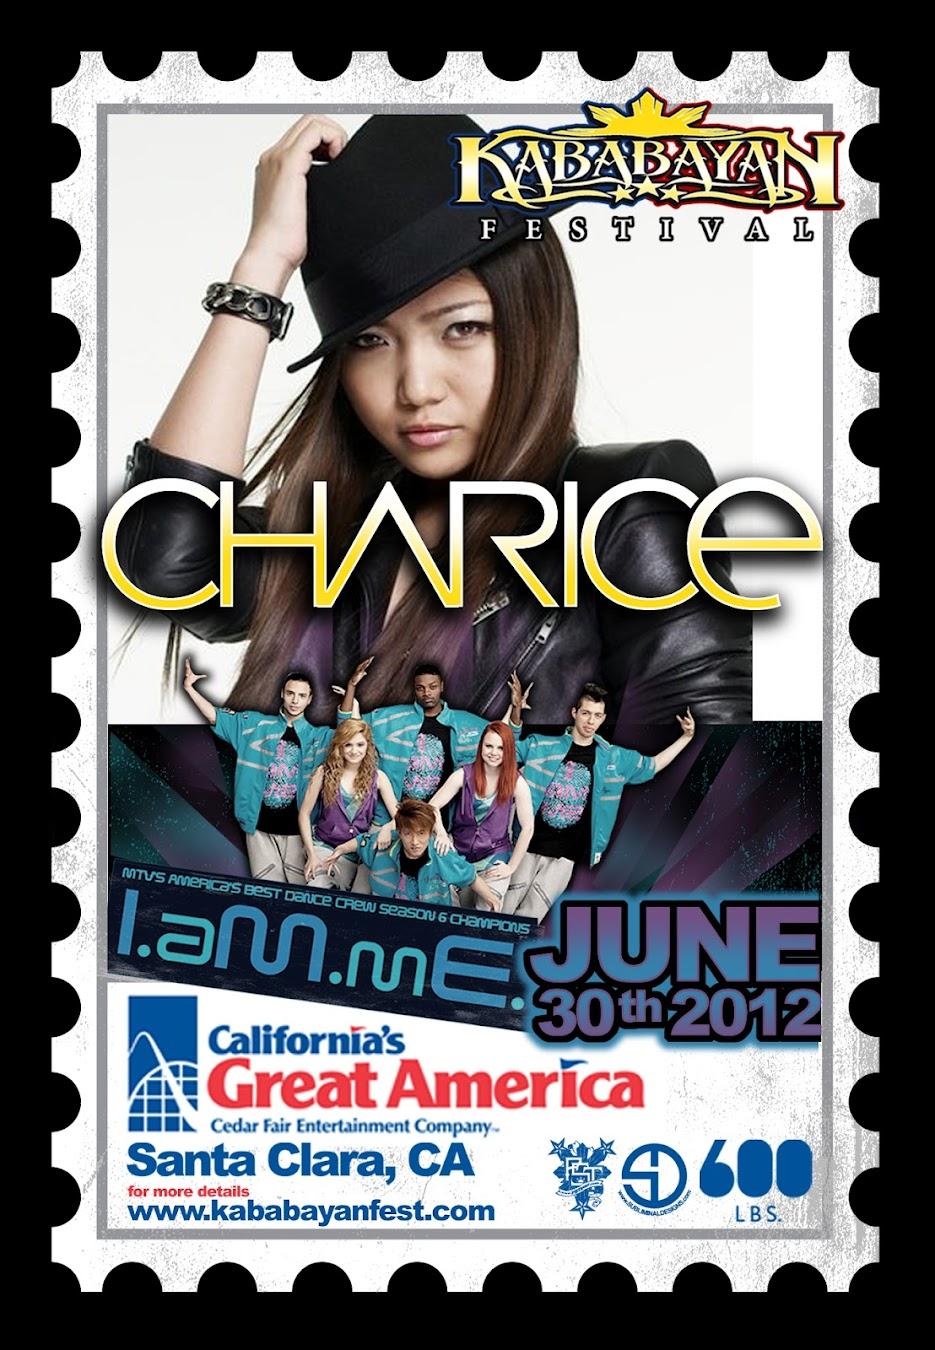 06/30/12 - Kababayan Fest - California's Great America, Santa Clara, CA Window